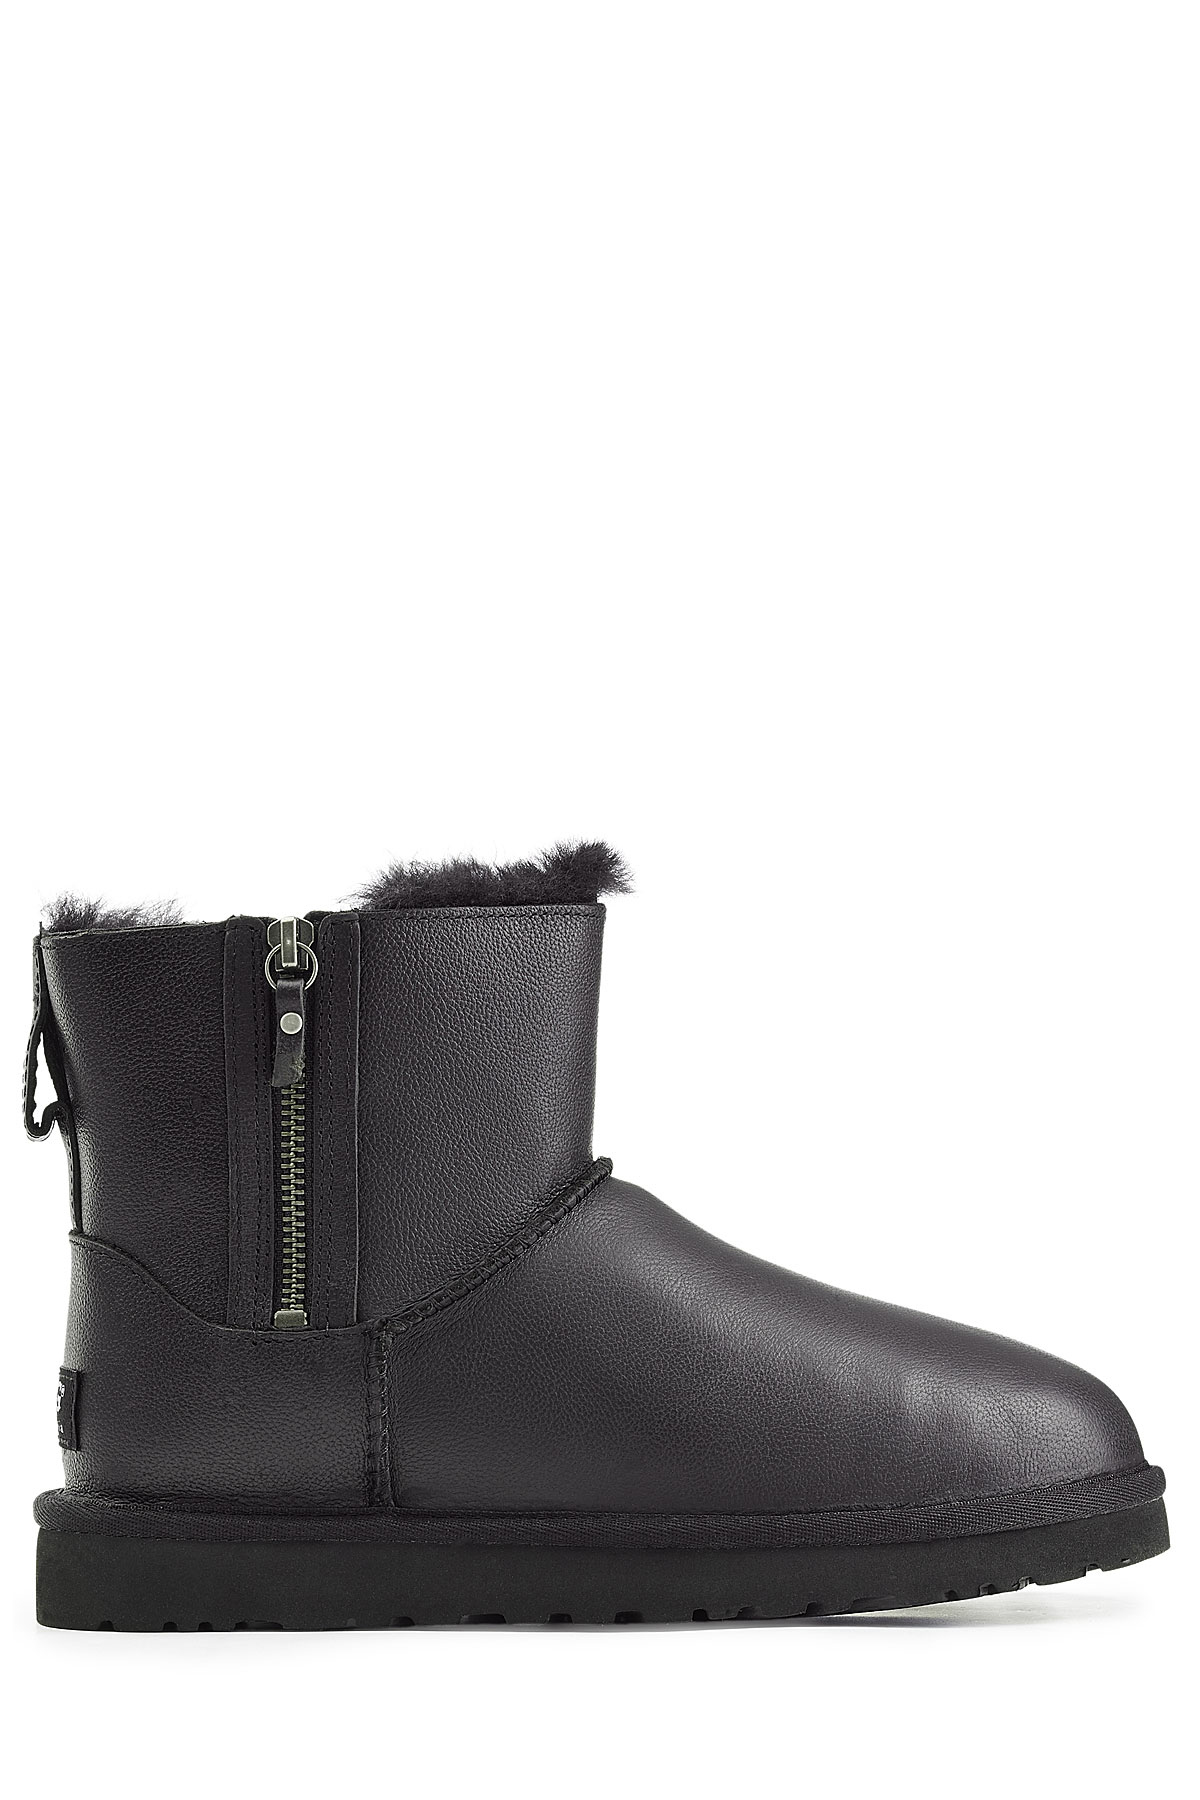 daa857162f6 UGG Classic Mini Double Zip Boots - Black